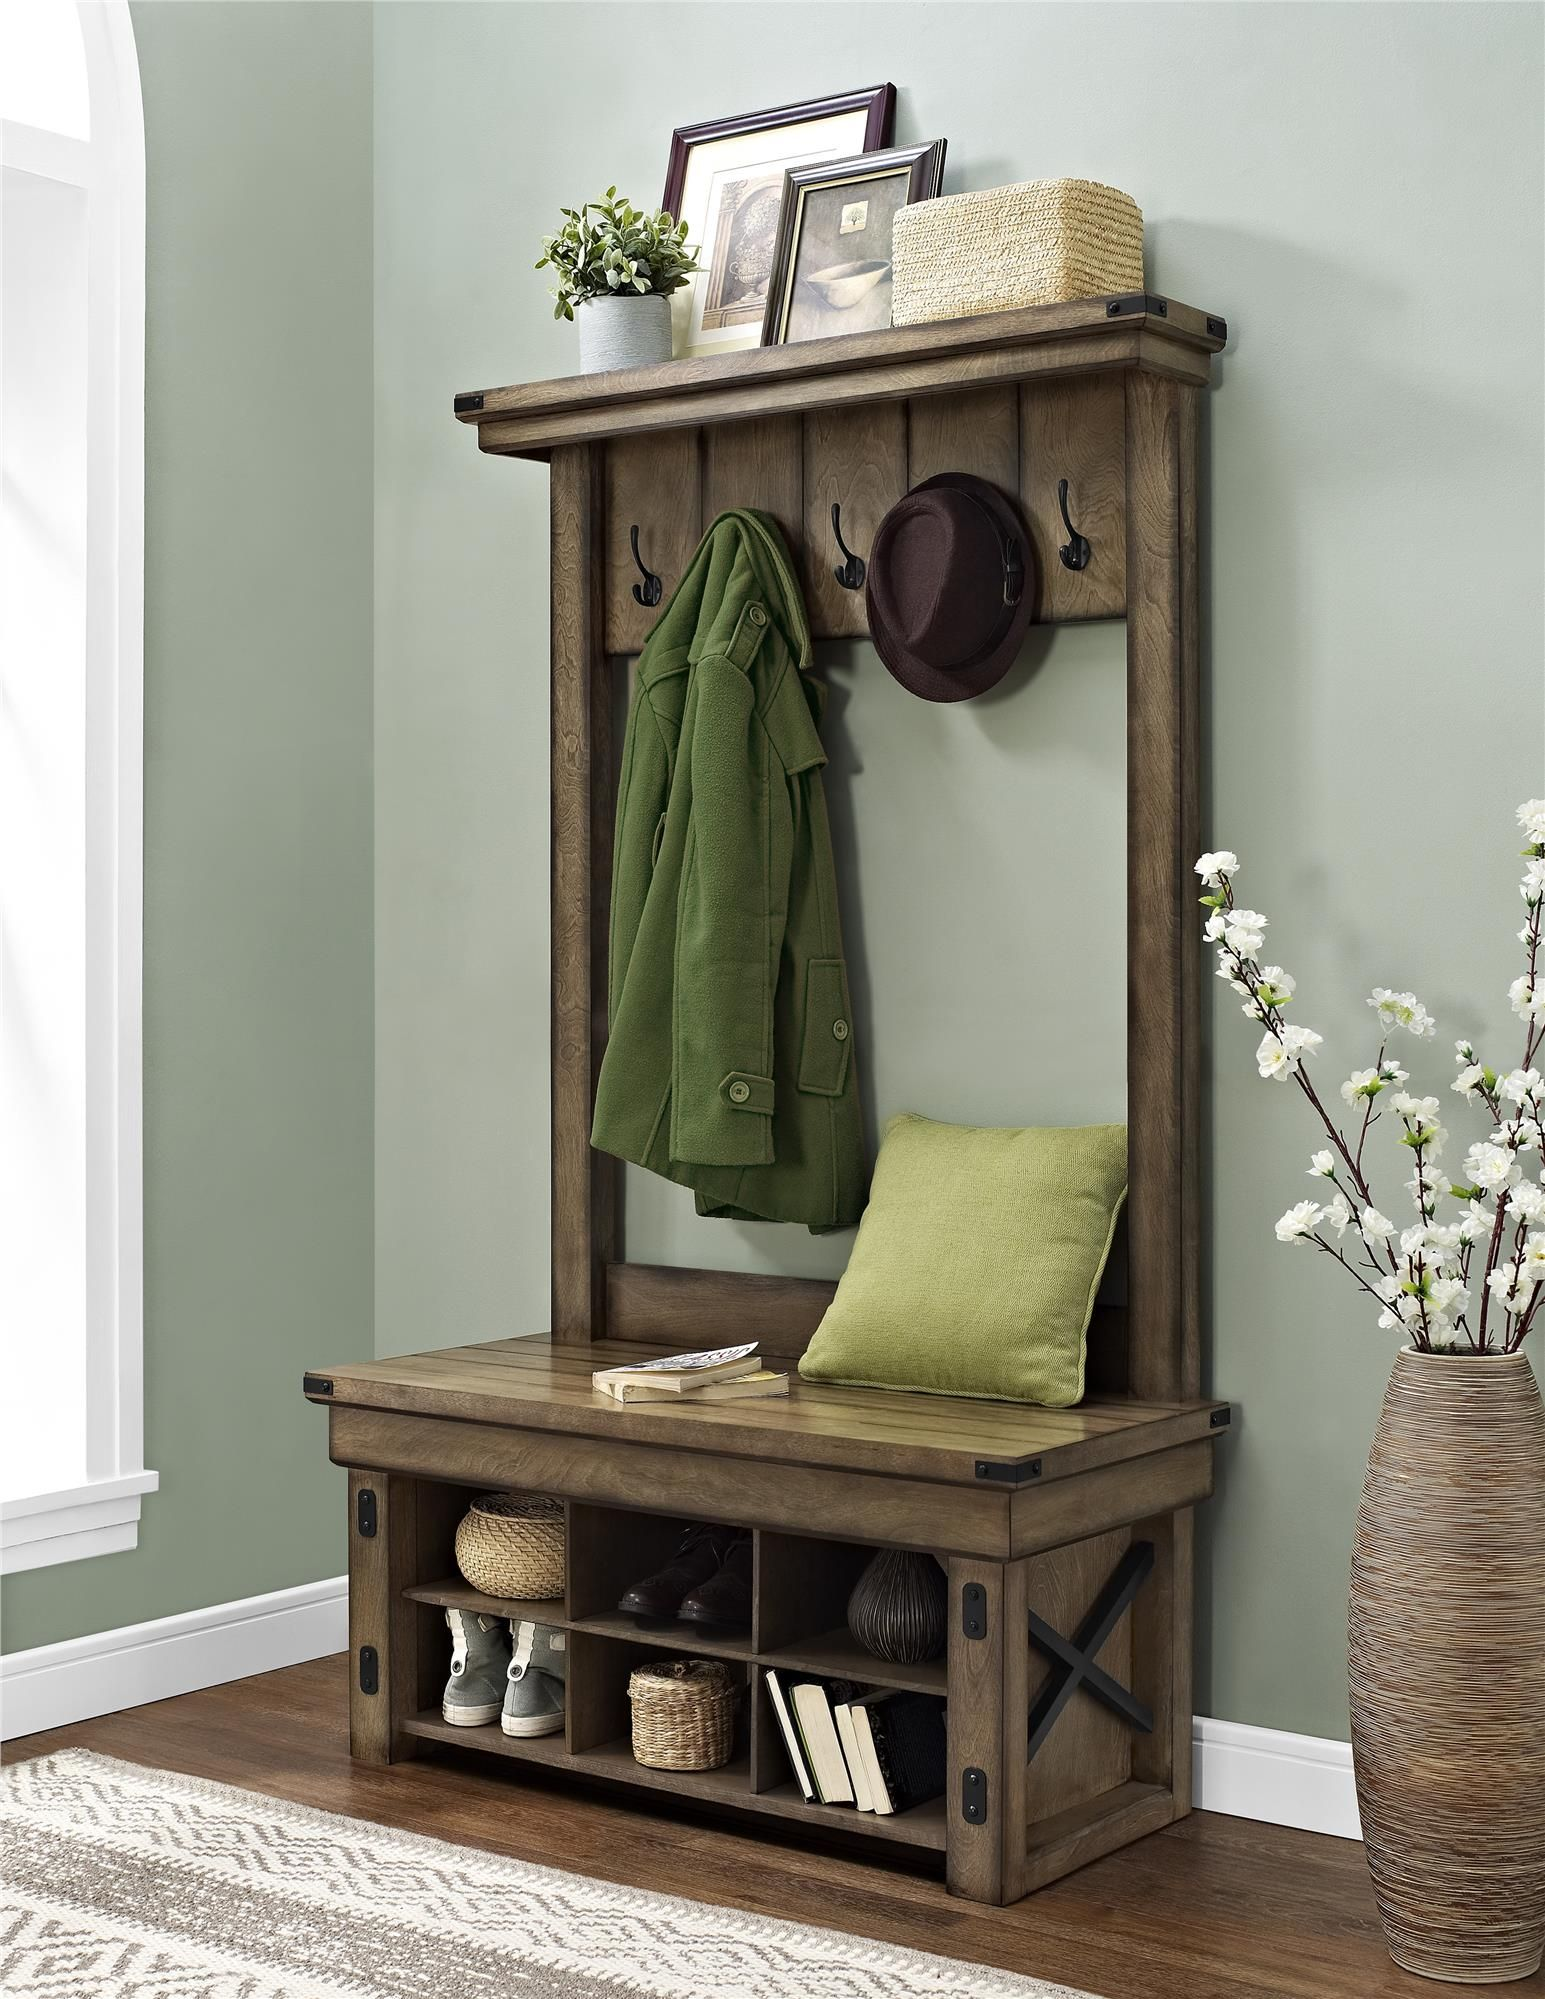 Lowest Price On Altra Furniture Wildwood Wood Veneer Entryway Hall Tree  With Storage Bench, Rustic